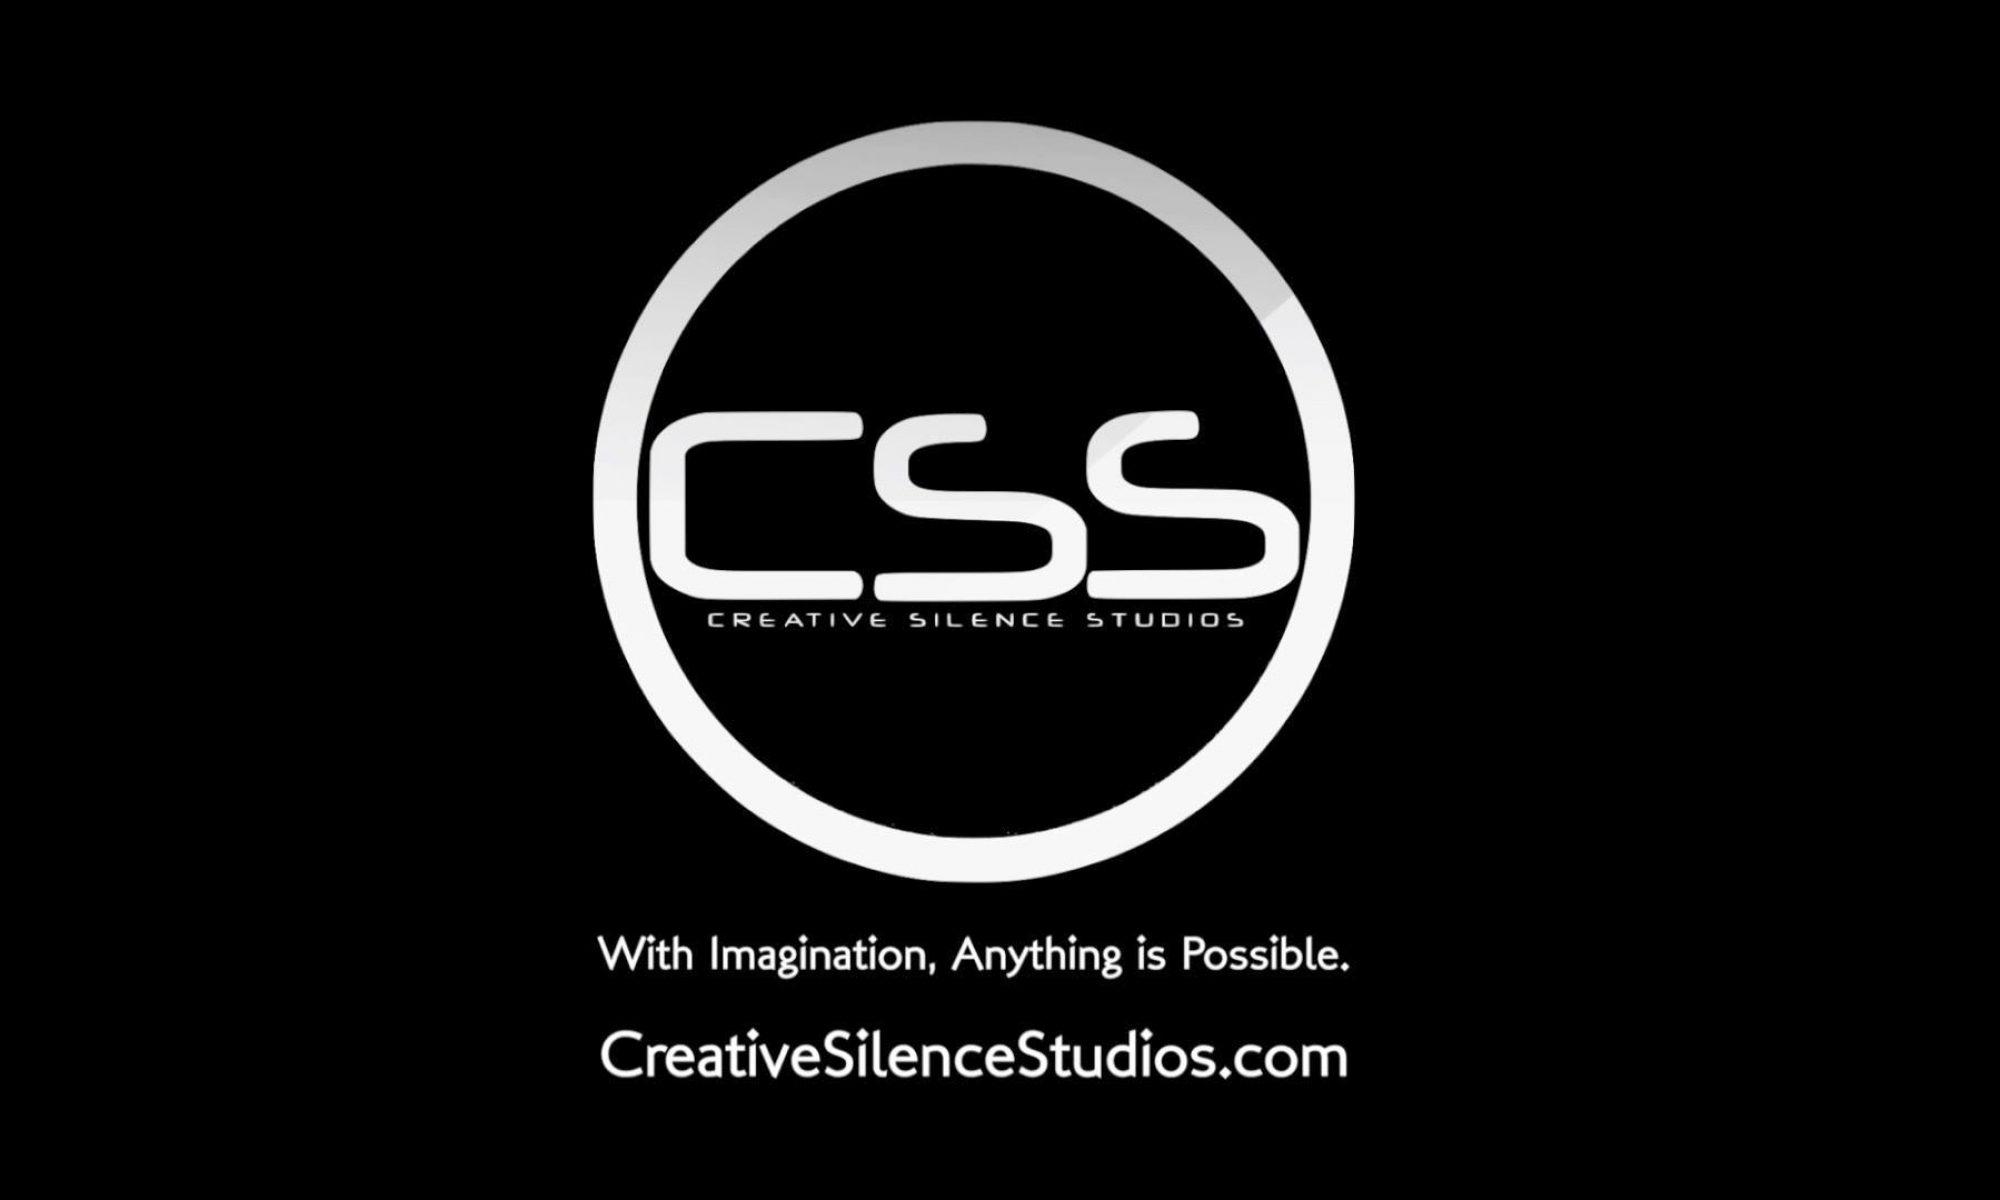 Creative Silence Studios